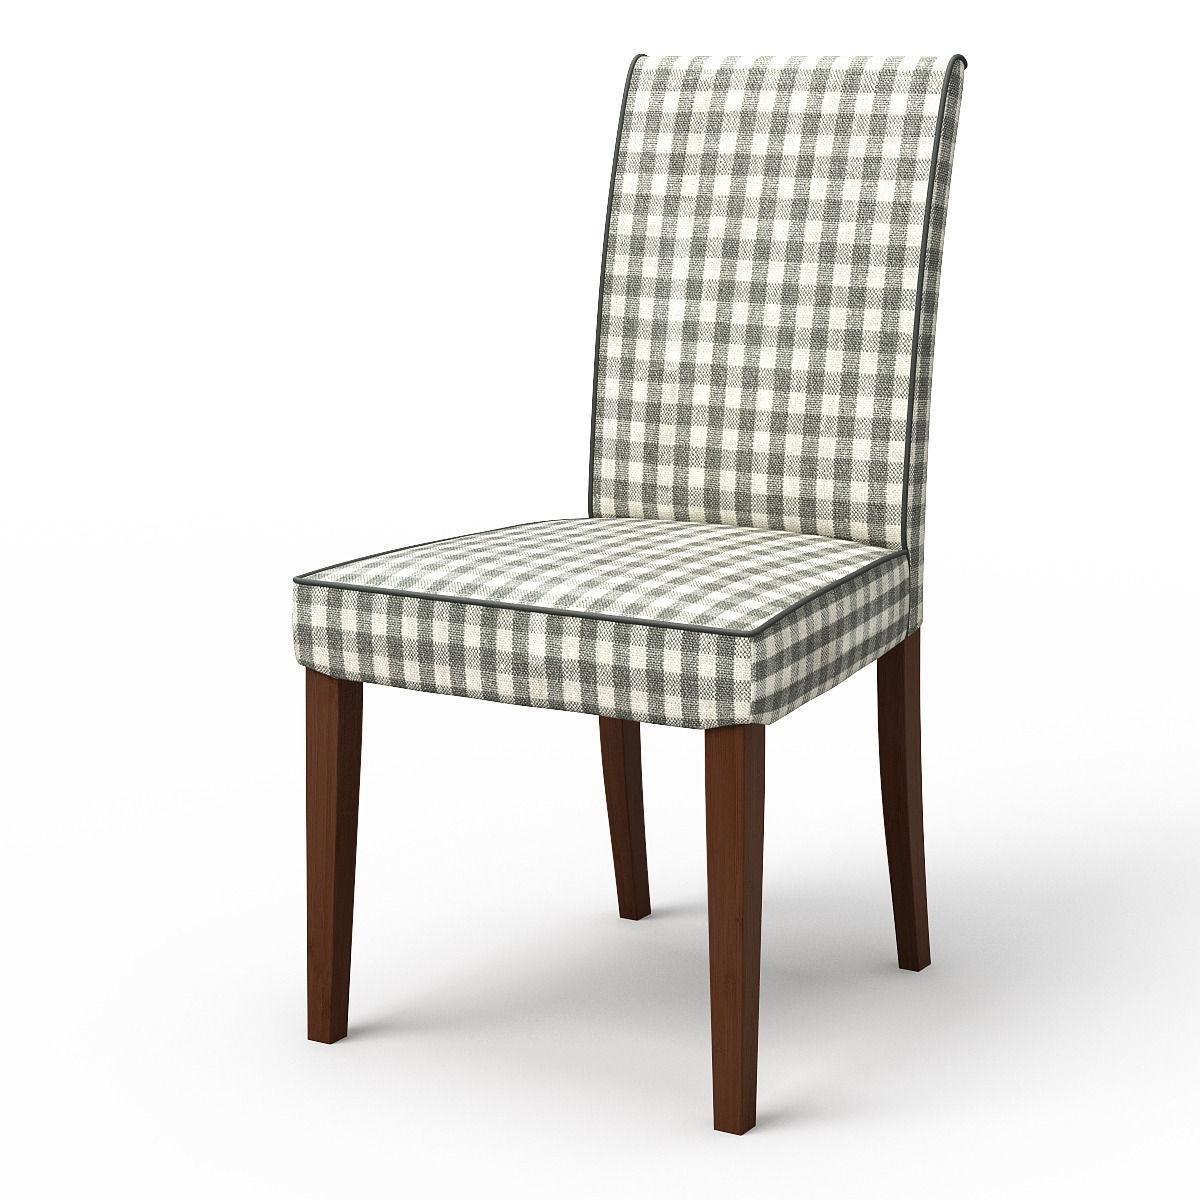 HENRIKSDAL Dining chair Rutna Multicolour 3D Model .max ...